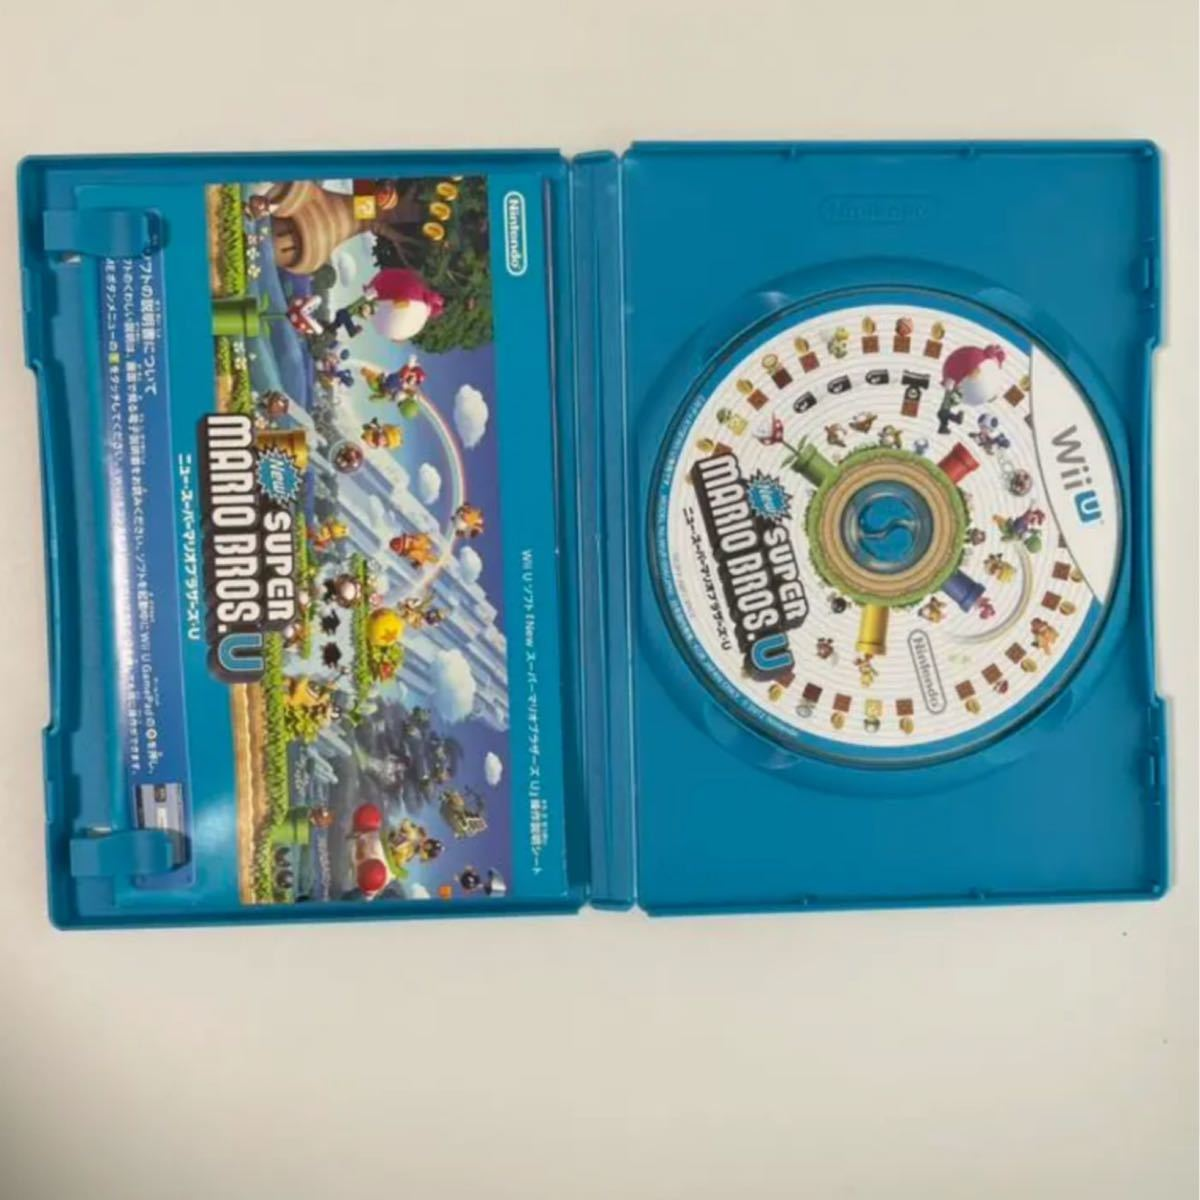 WiiU NewスーパーマリオブラザーズU WiiUソフト ニュースーパーマリオブラザーズU ソフト